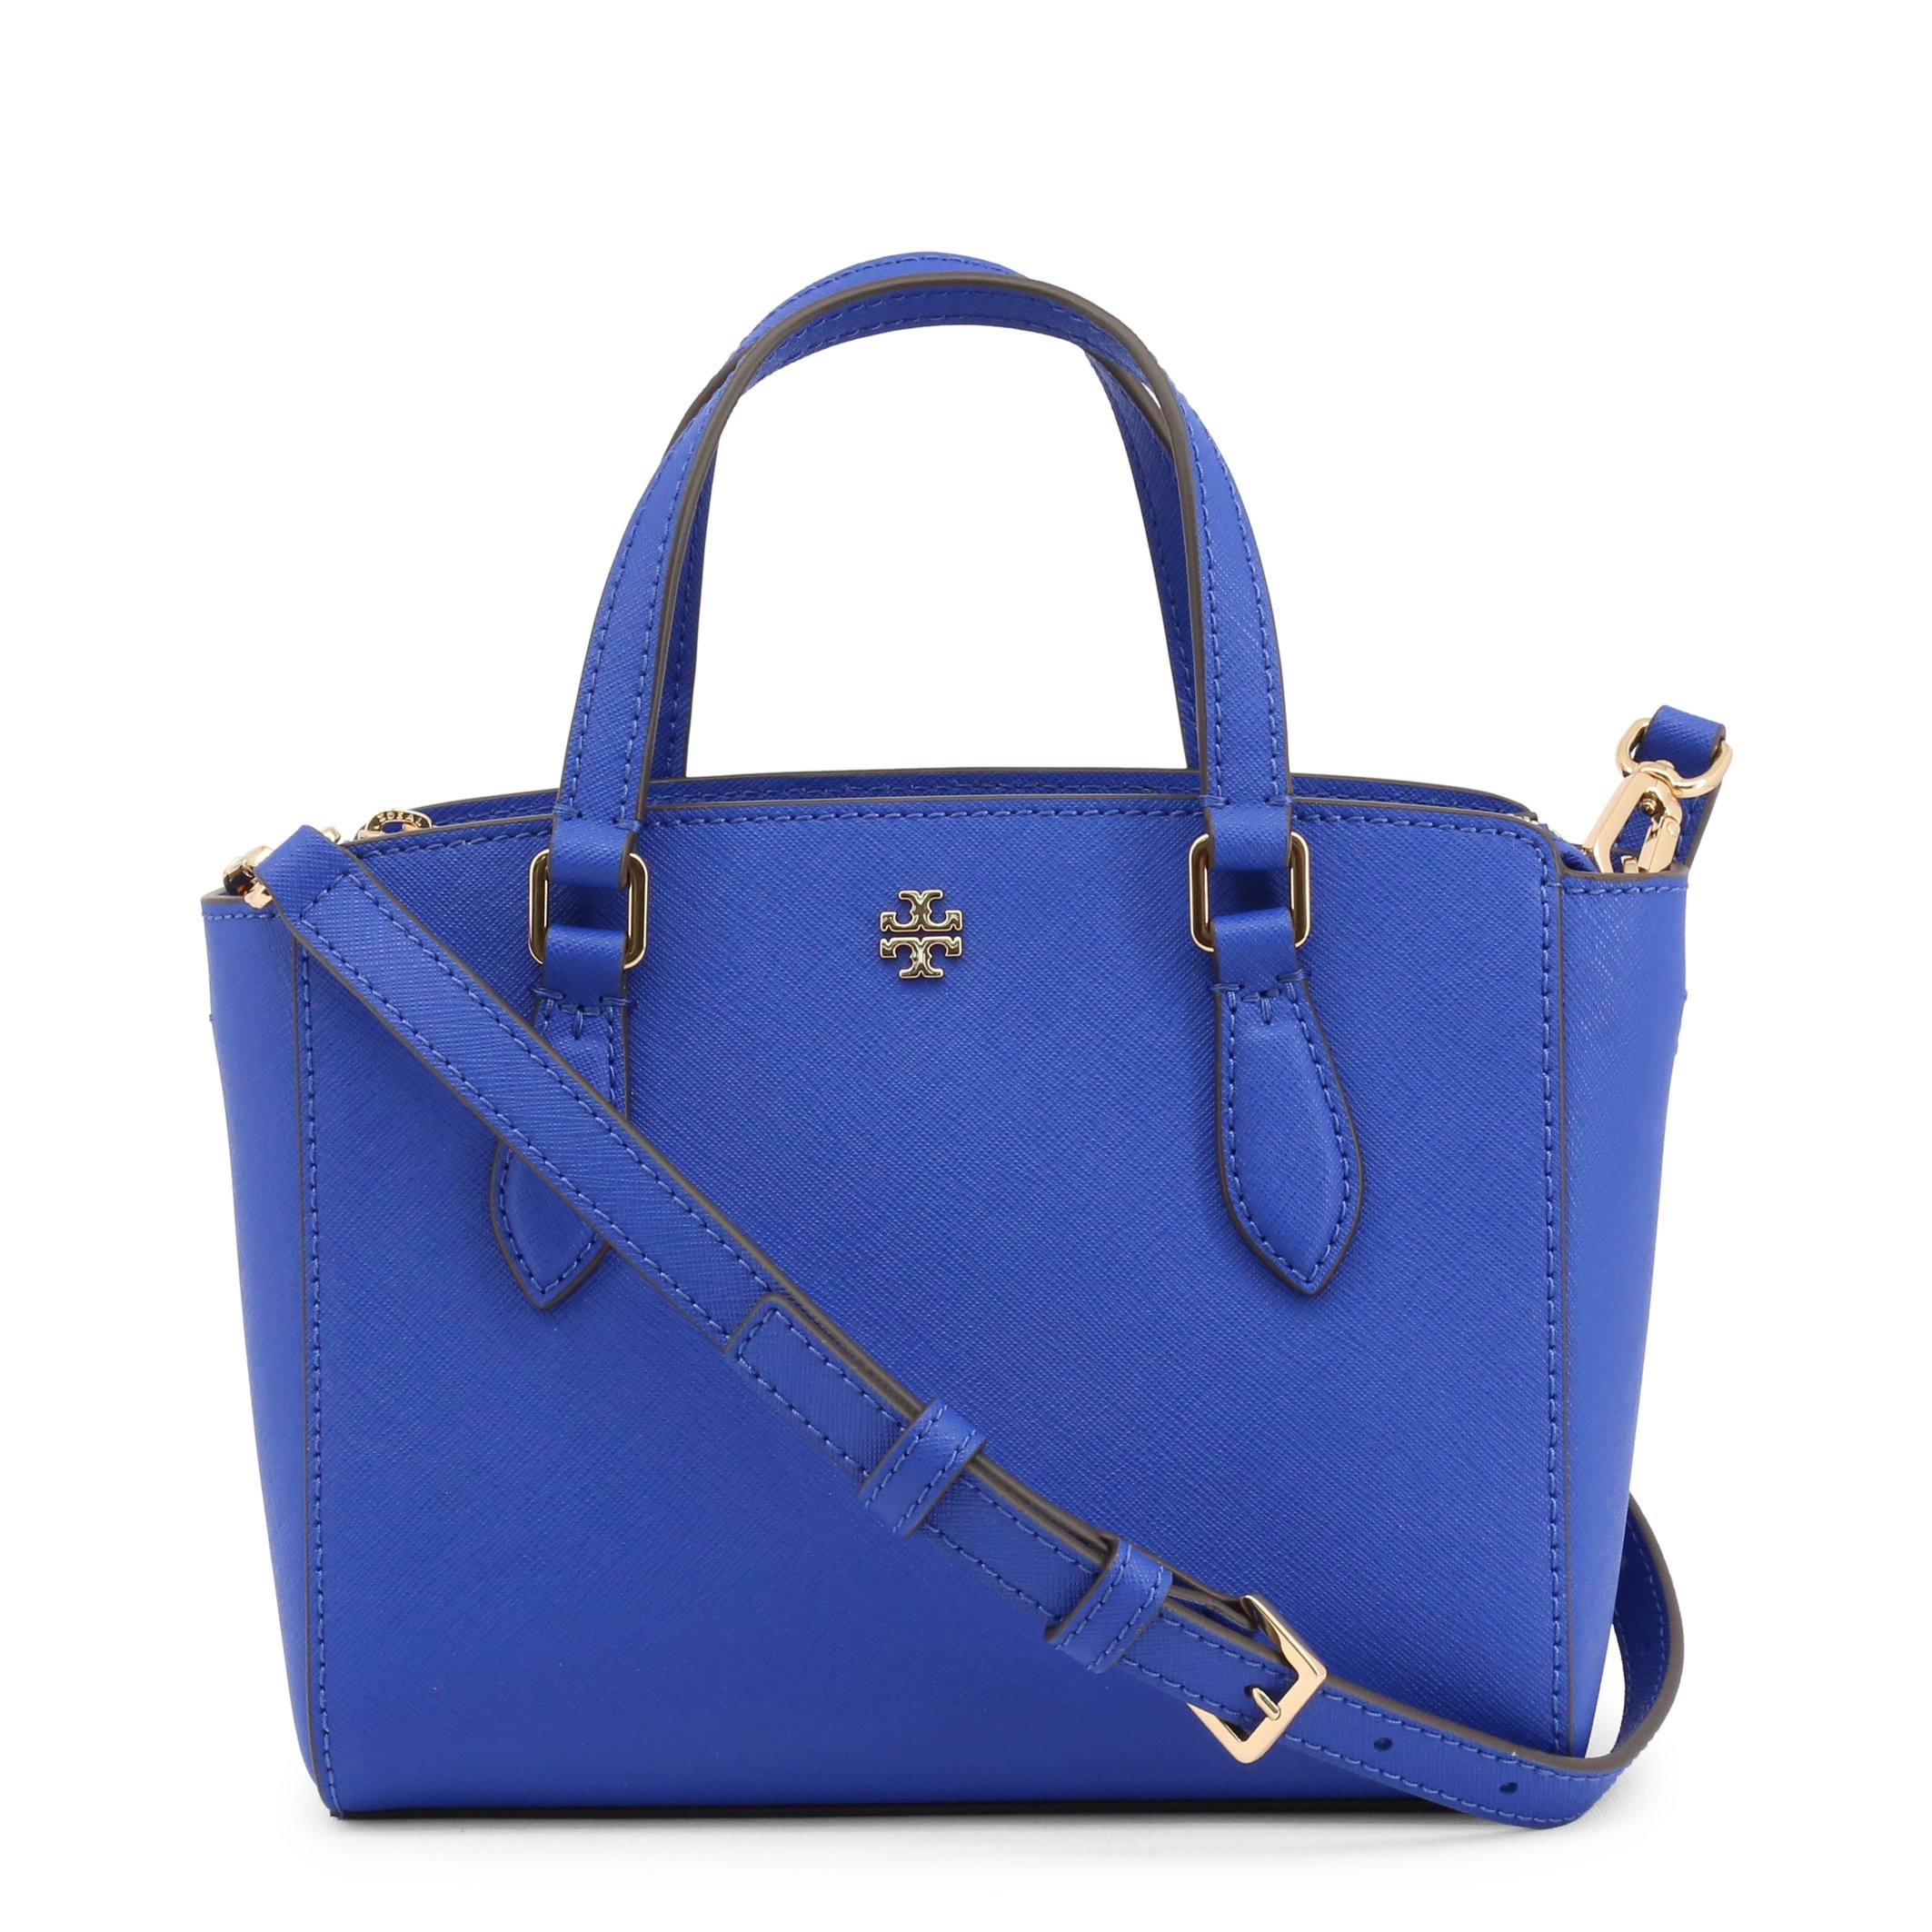 Tory Burch Women's Handbag Various Colours 64189 - blue NOSIZE